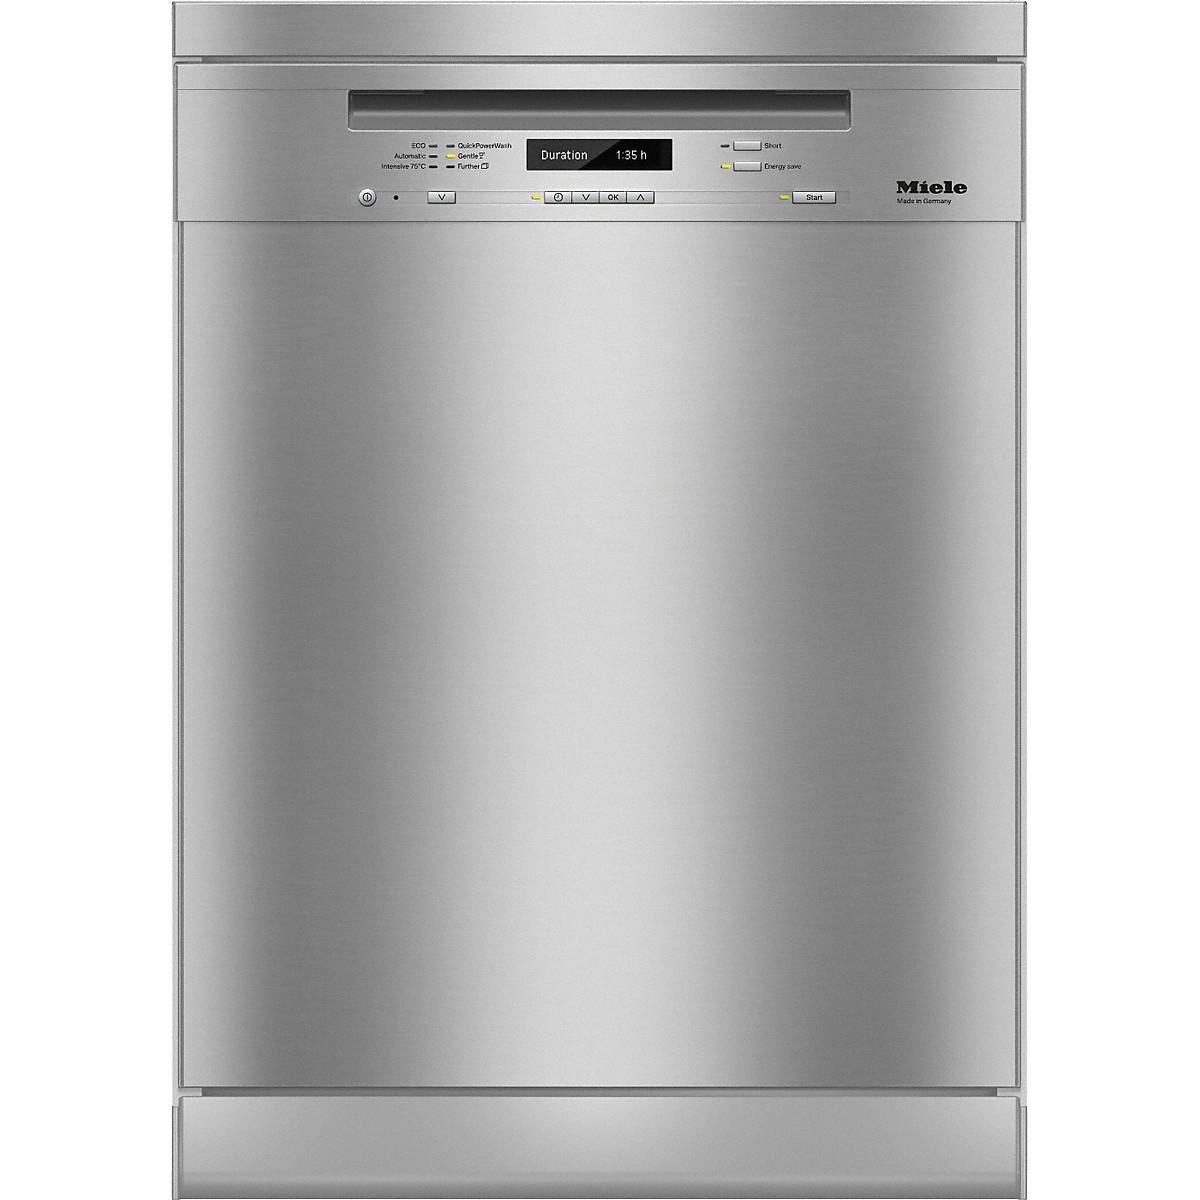 Mini Modern Kitchen Miele Gaggenau: Miele G 6730 SCi Semi-integrated Dishwasher